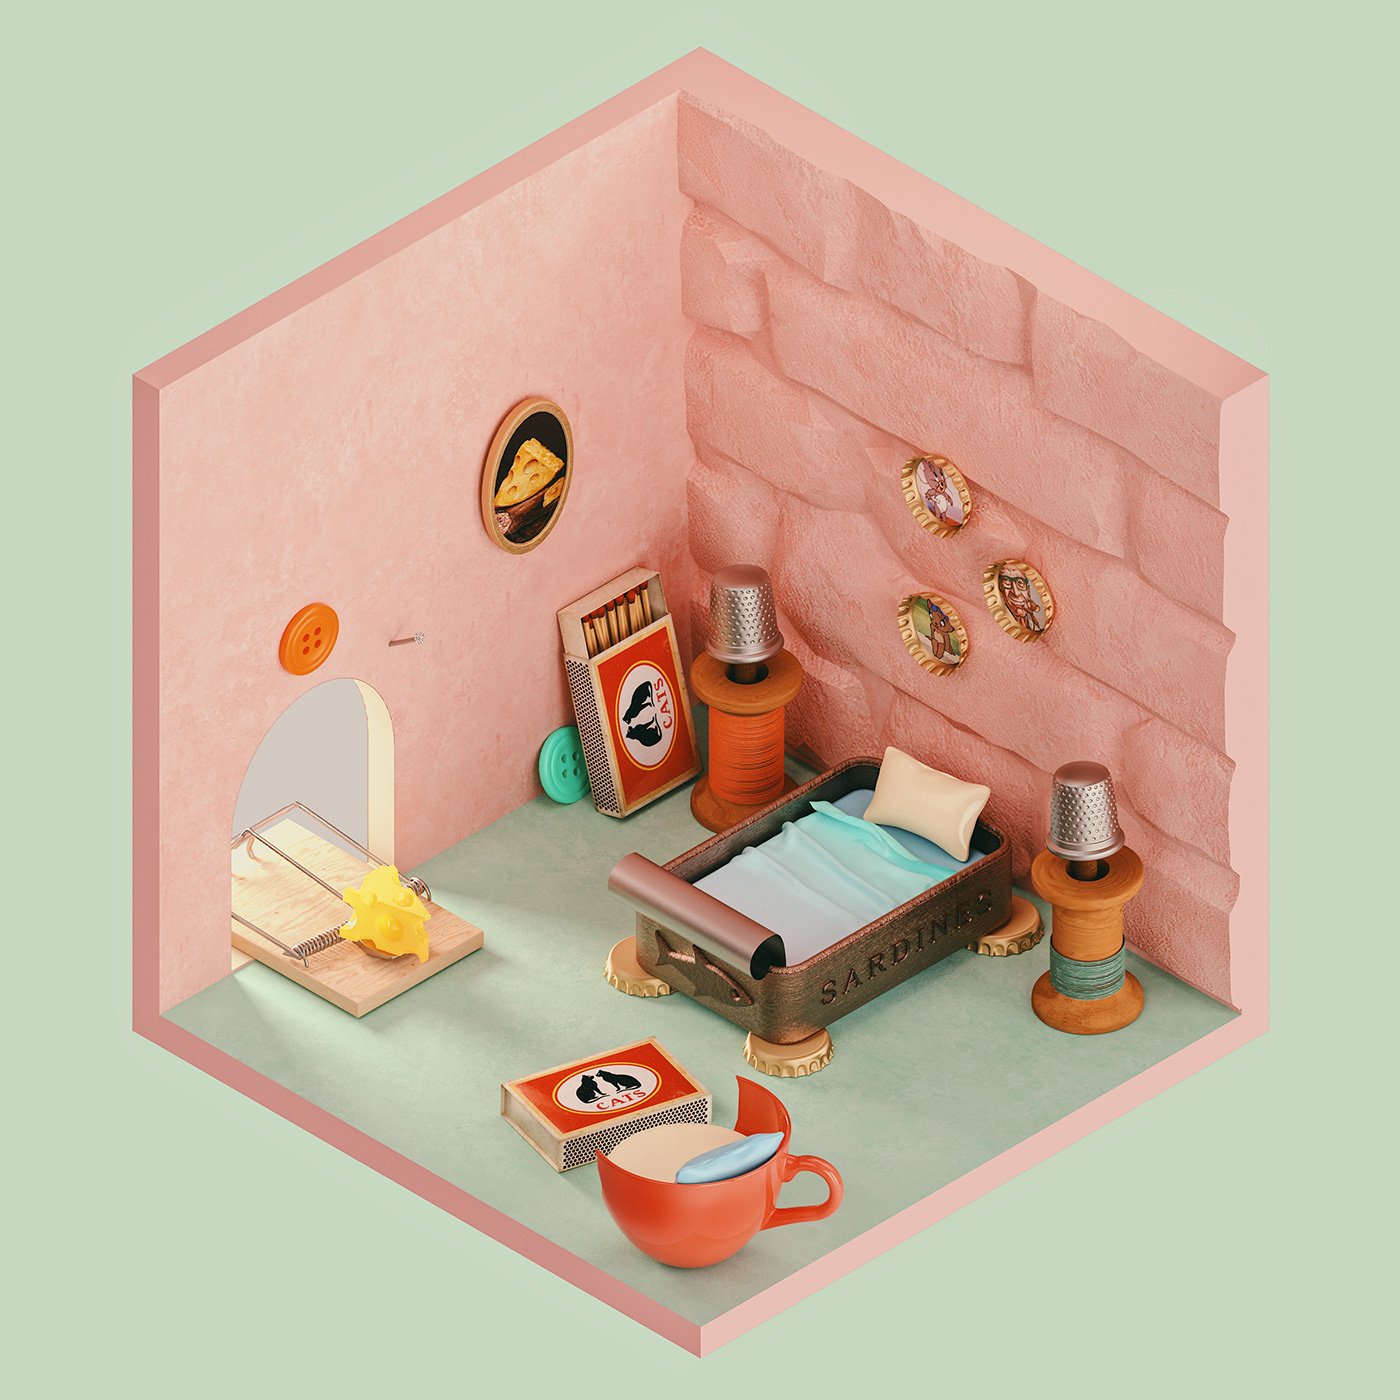 Image may contain: cartoon, wall and indoor